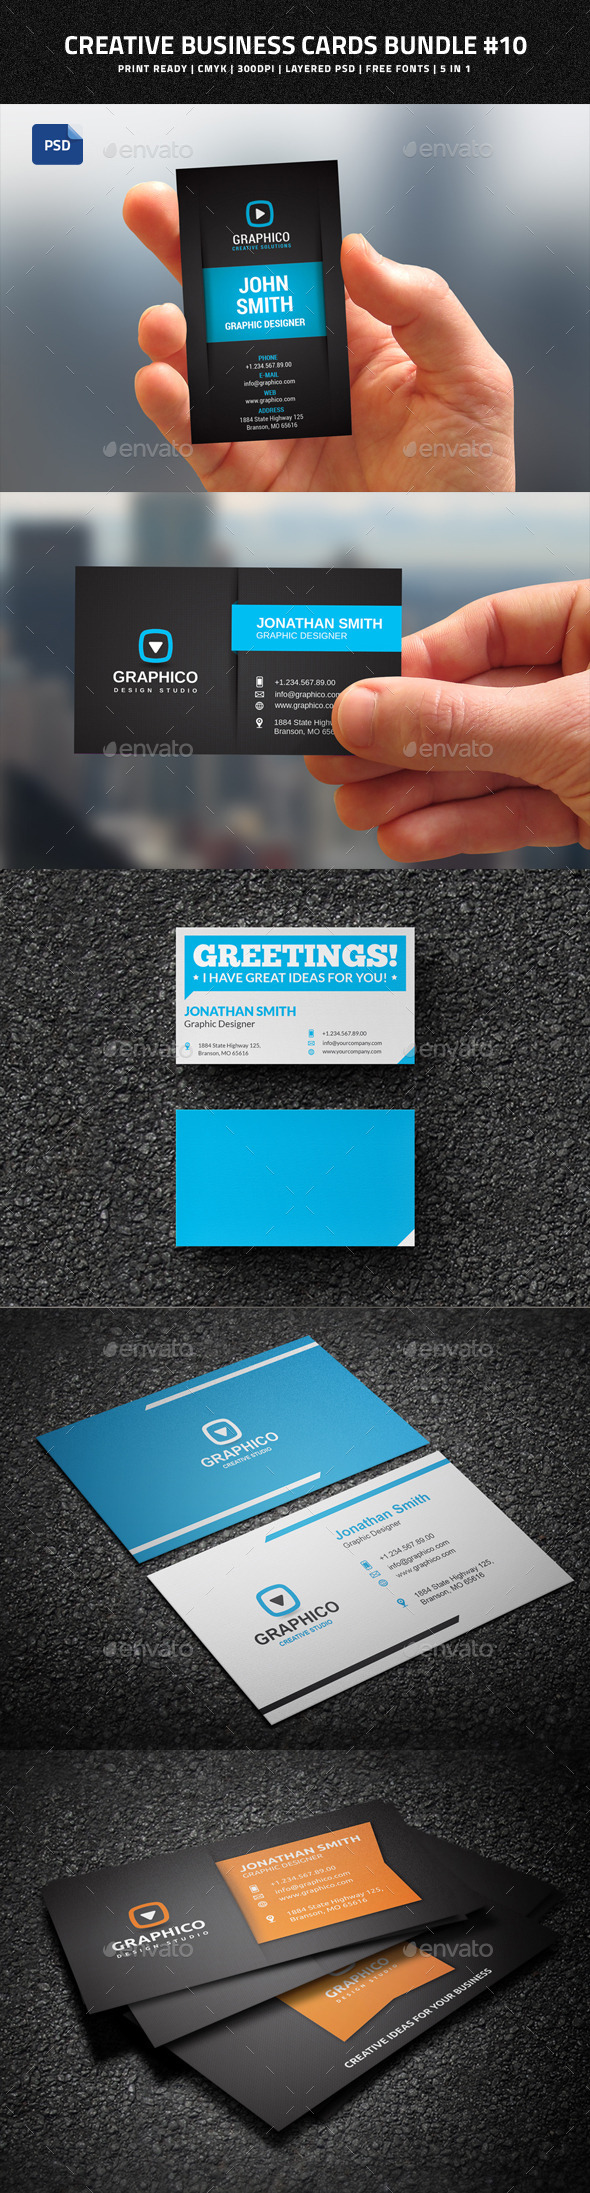 Creative Business Cards Bundle #10 - Creative Business Cards